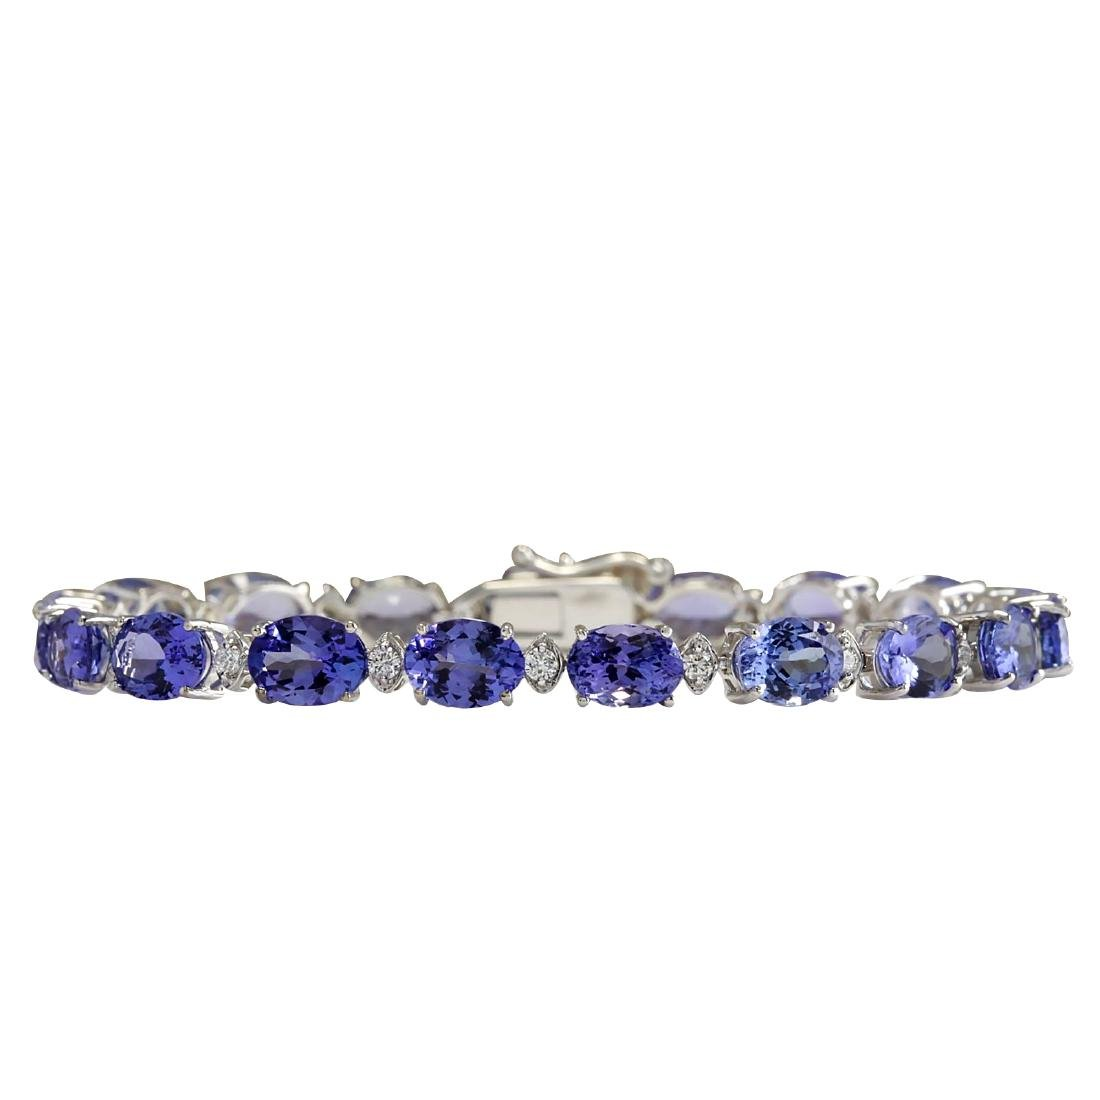 23.35CTW Natural Tanzanite And Diamond Bracelet In 18K